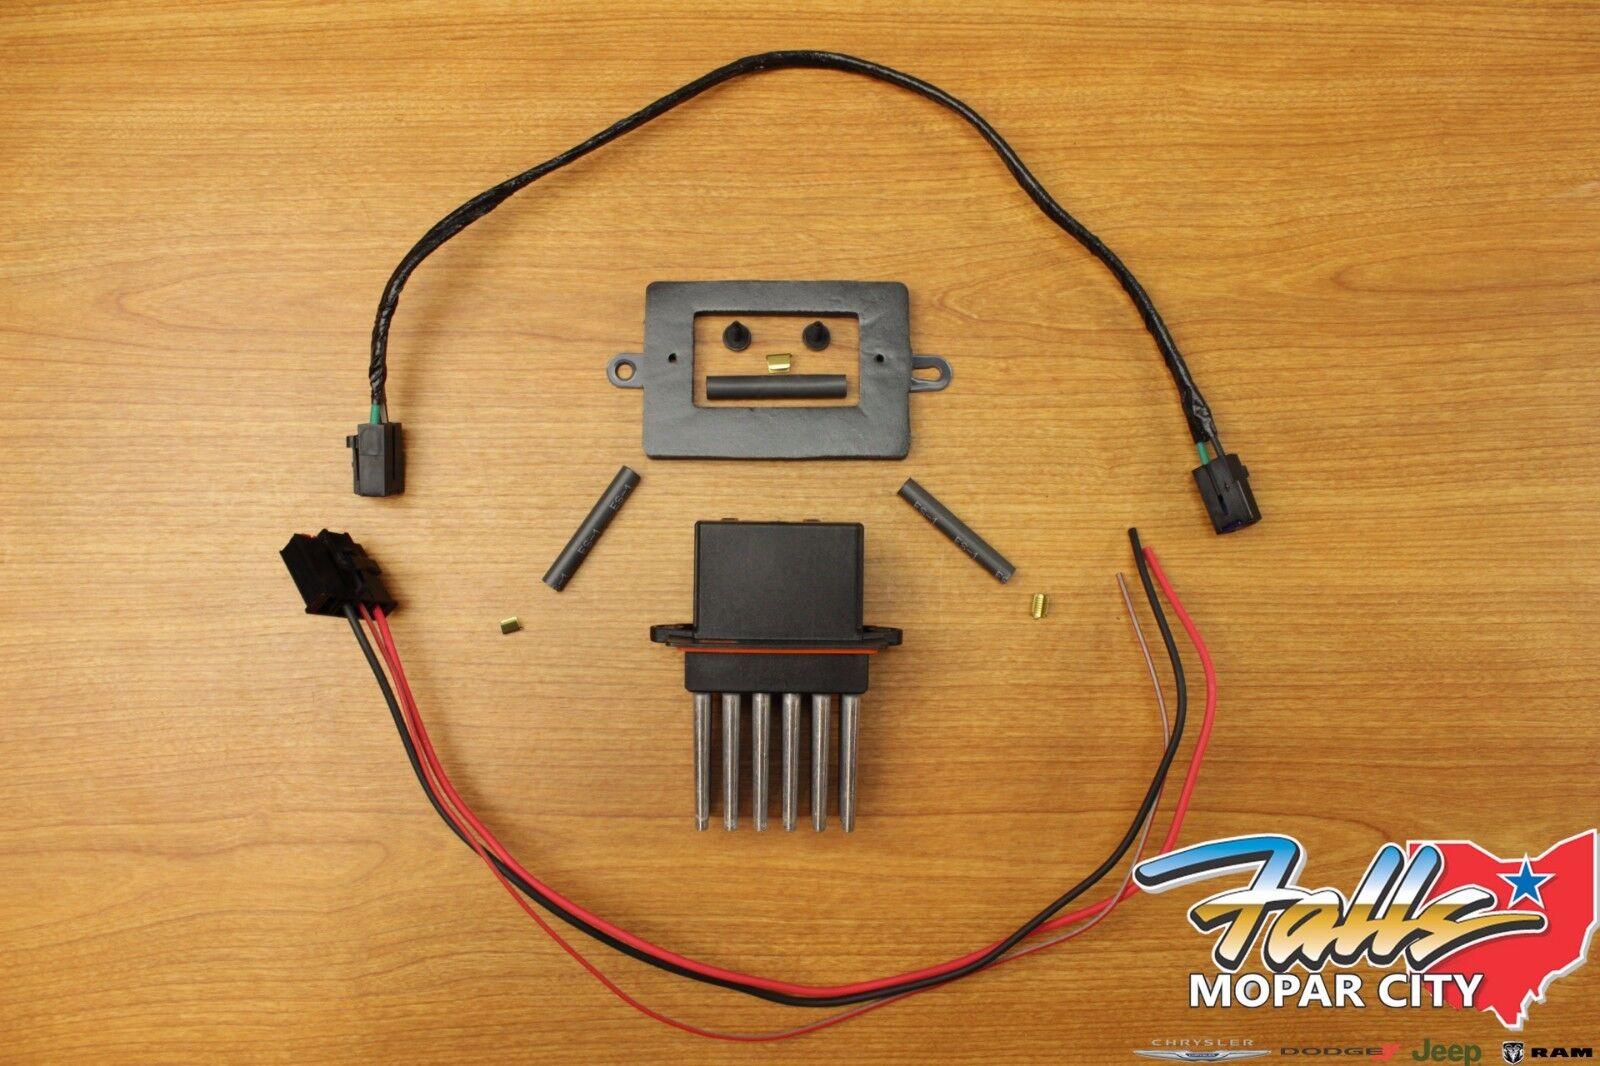 Trailer Wiring Harness 1999 Jeep Grand Cherokee Solutions Wj Fuse Diagram Resistor 2004 Diy Diagrams